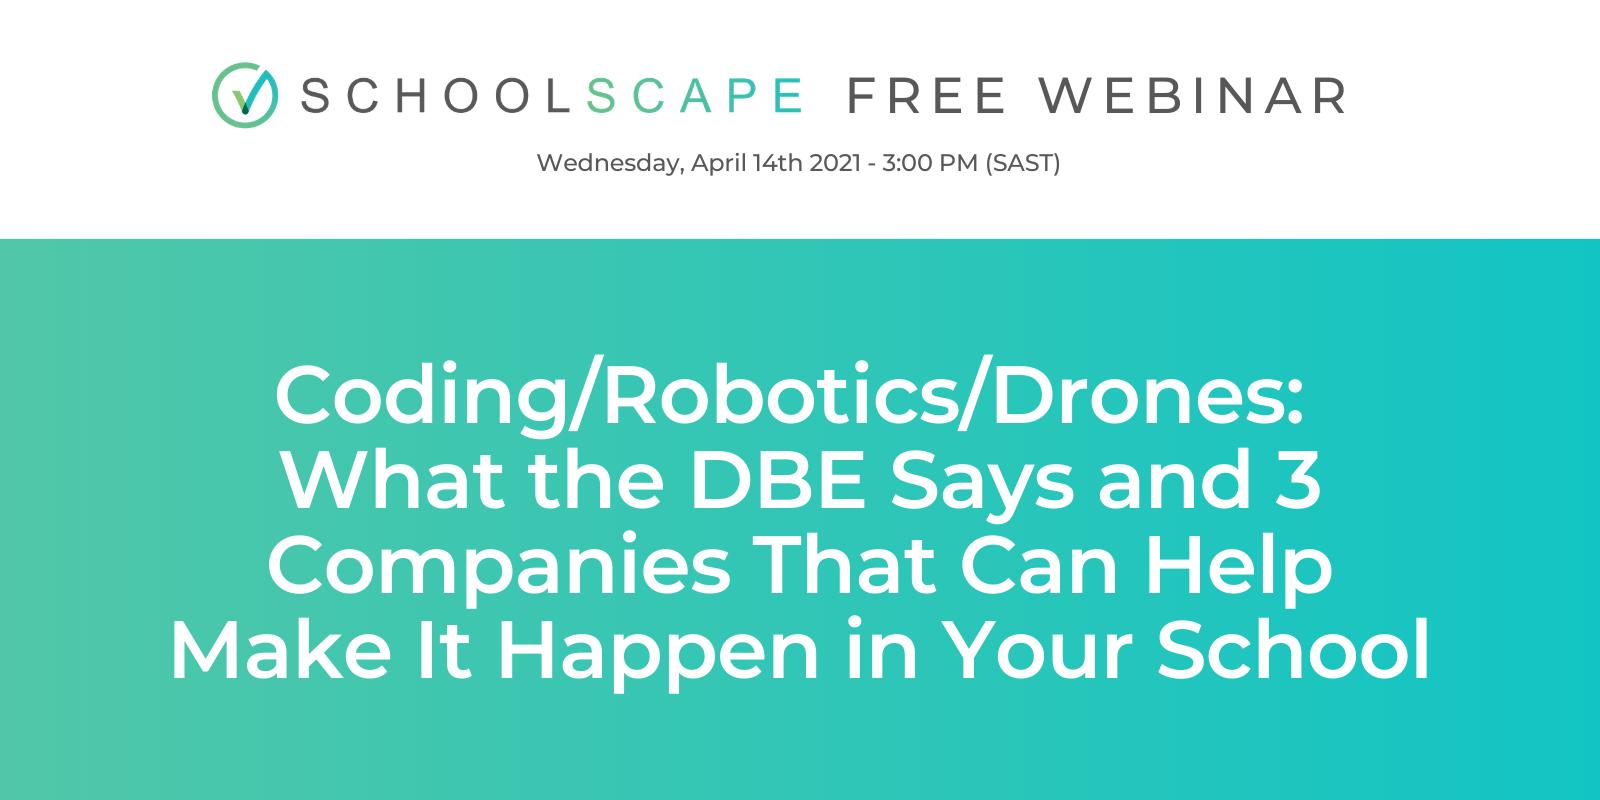 Webinar: Coding/Robotics/Drones